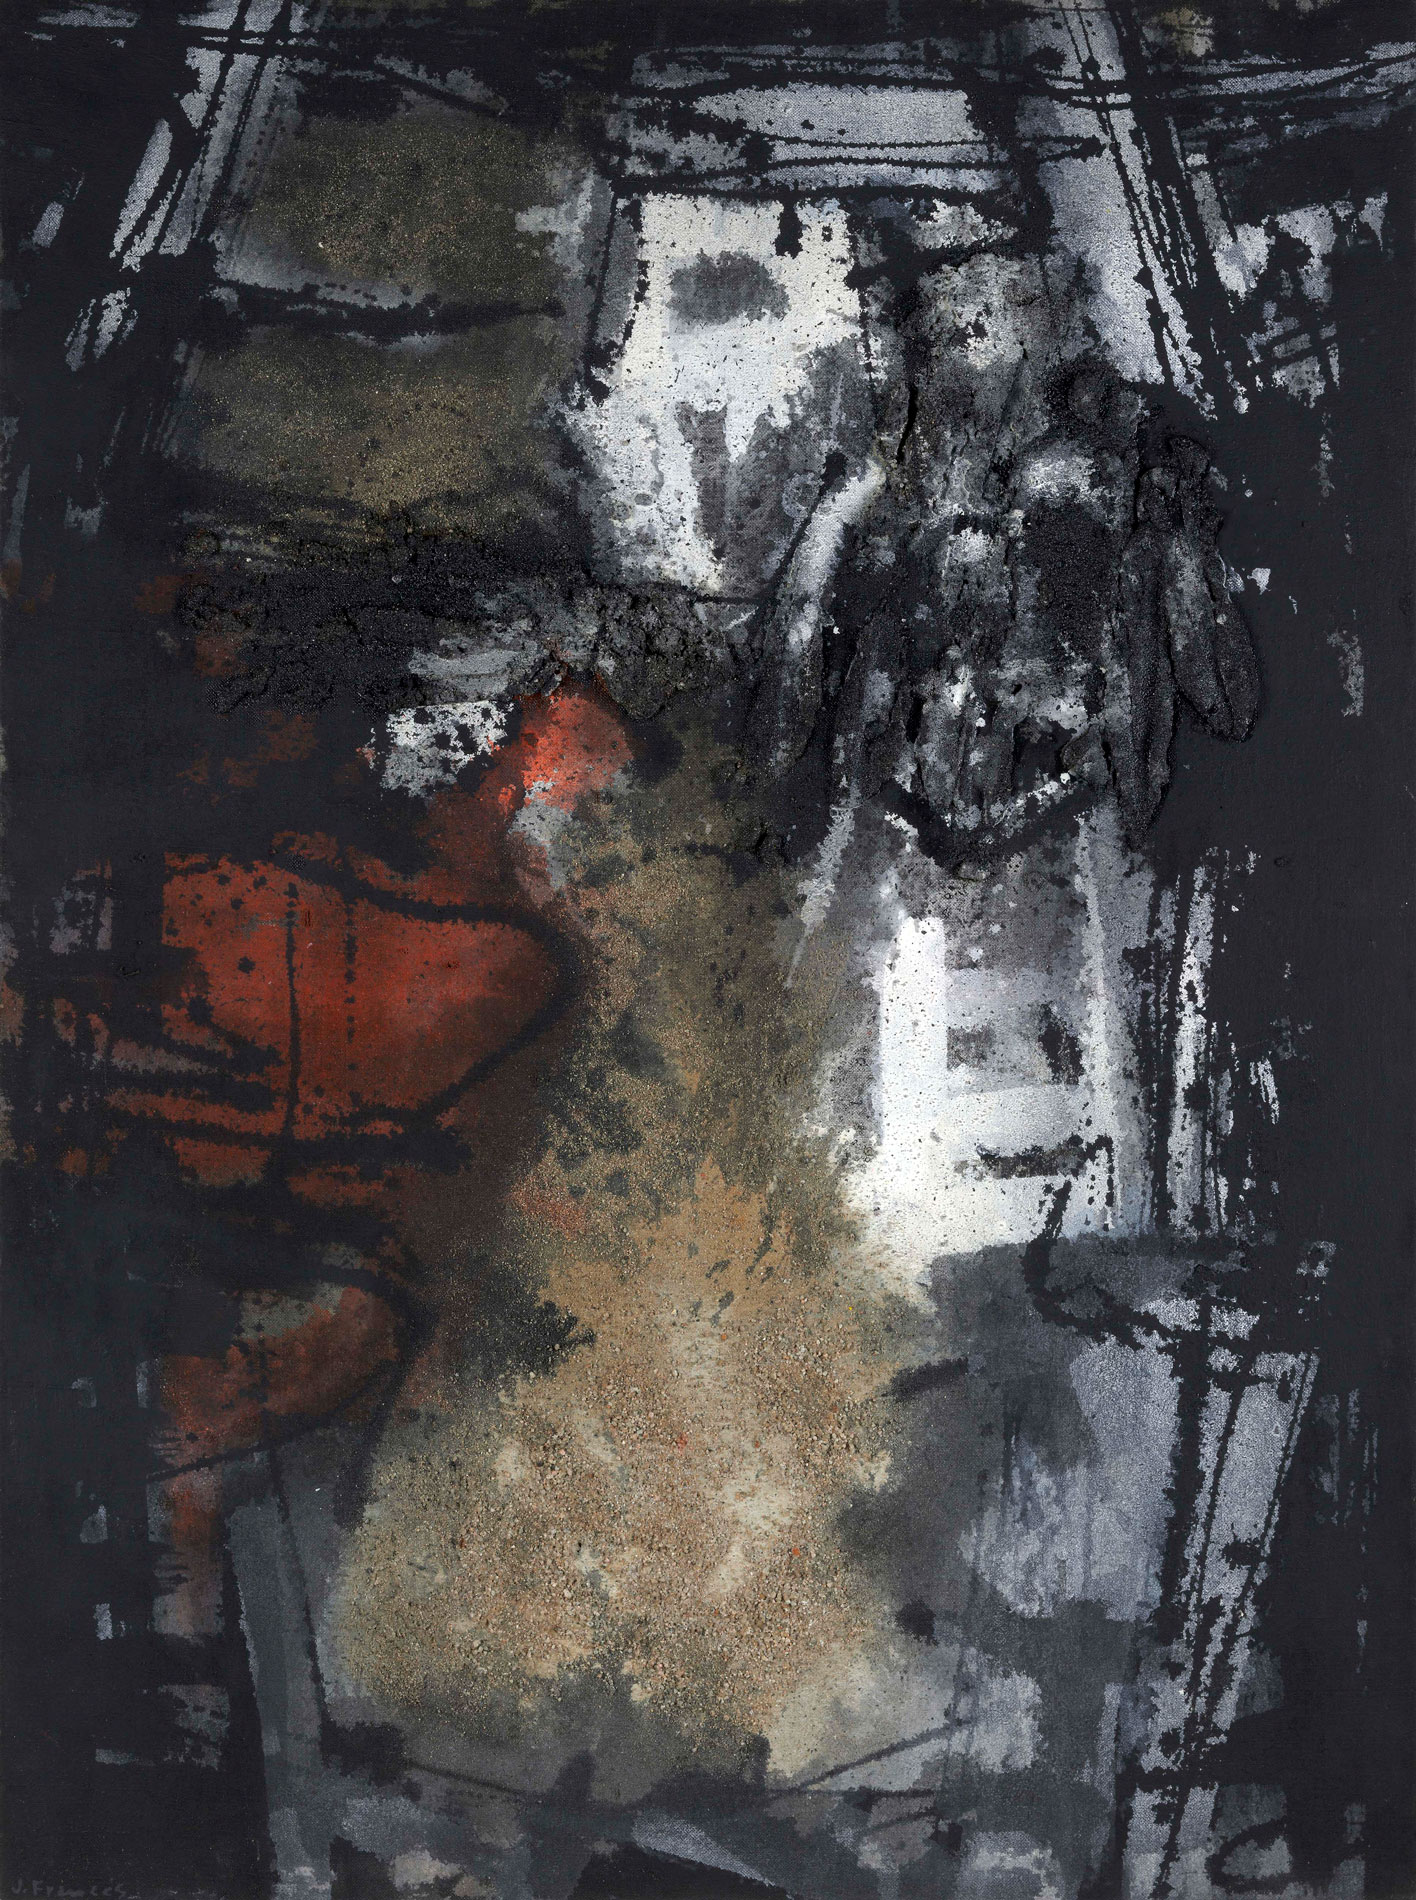 El hombre y la noche 1 - Juana Francés